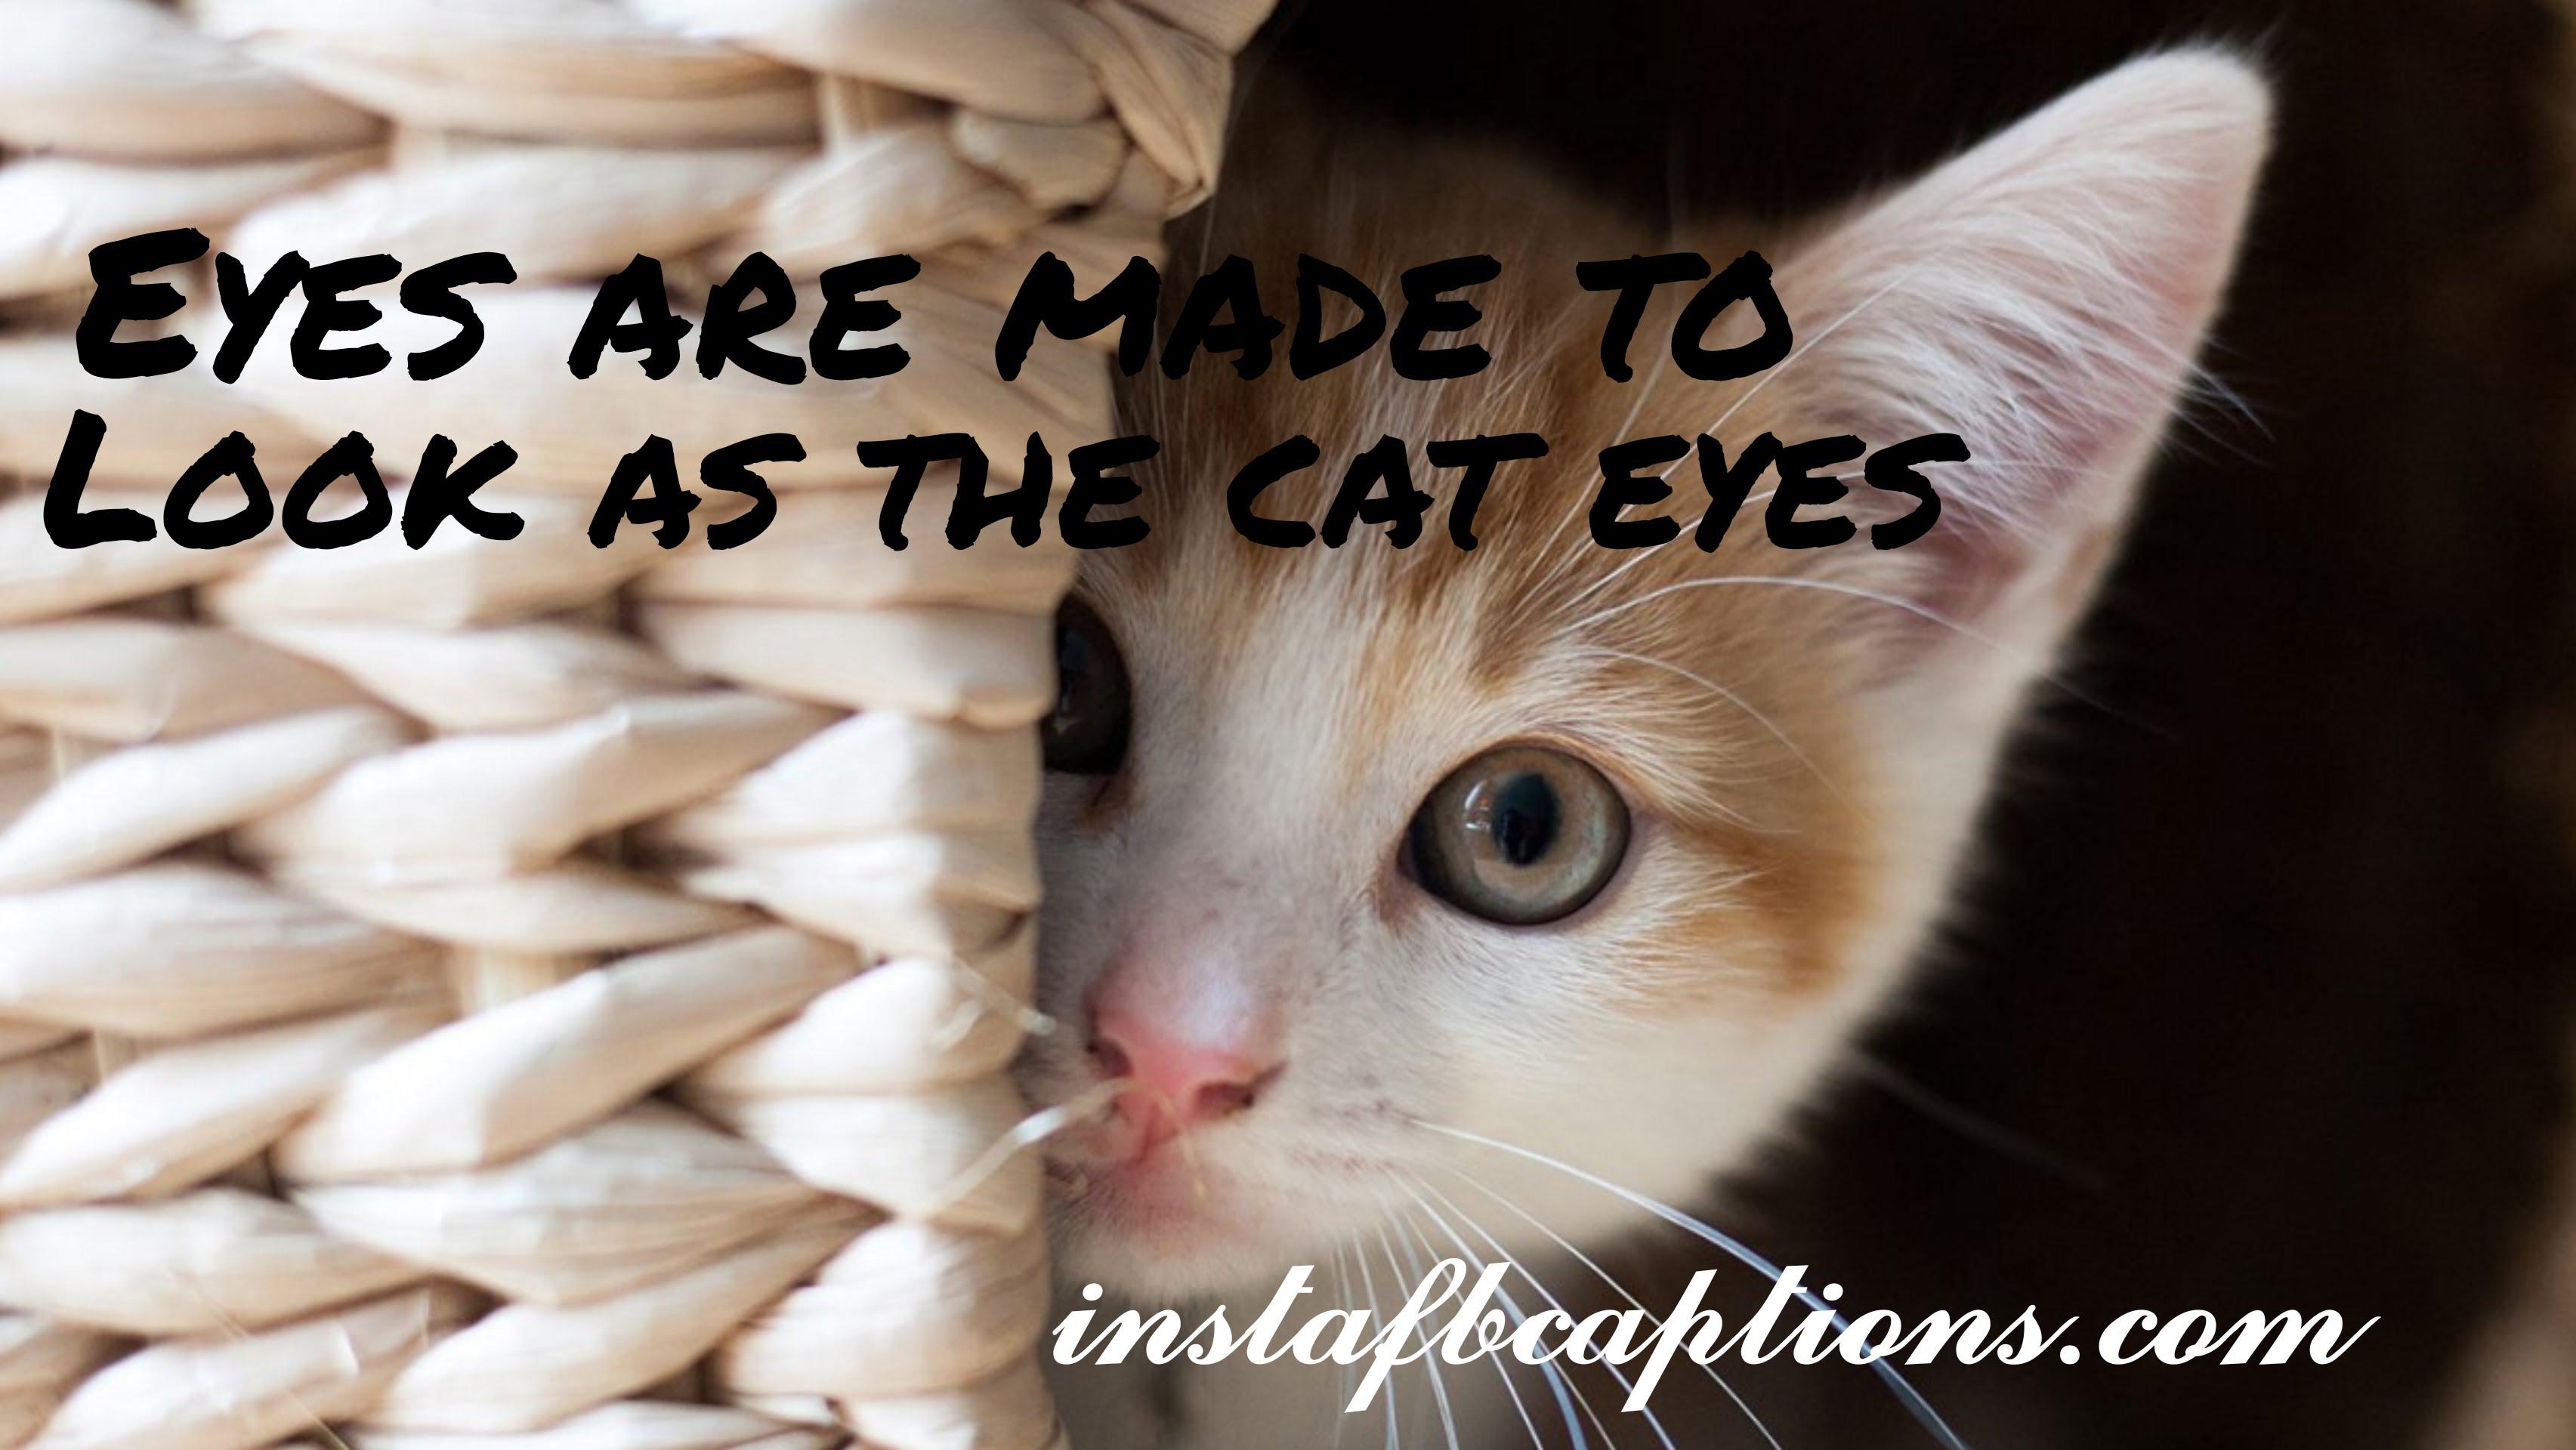 Cat Eyes Captions  - Cat Eyes Captions - 150+ CATS Instagram Captions 2021